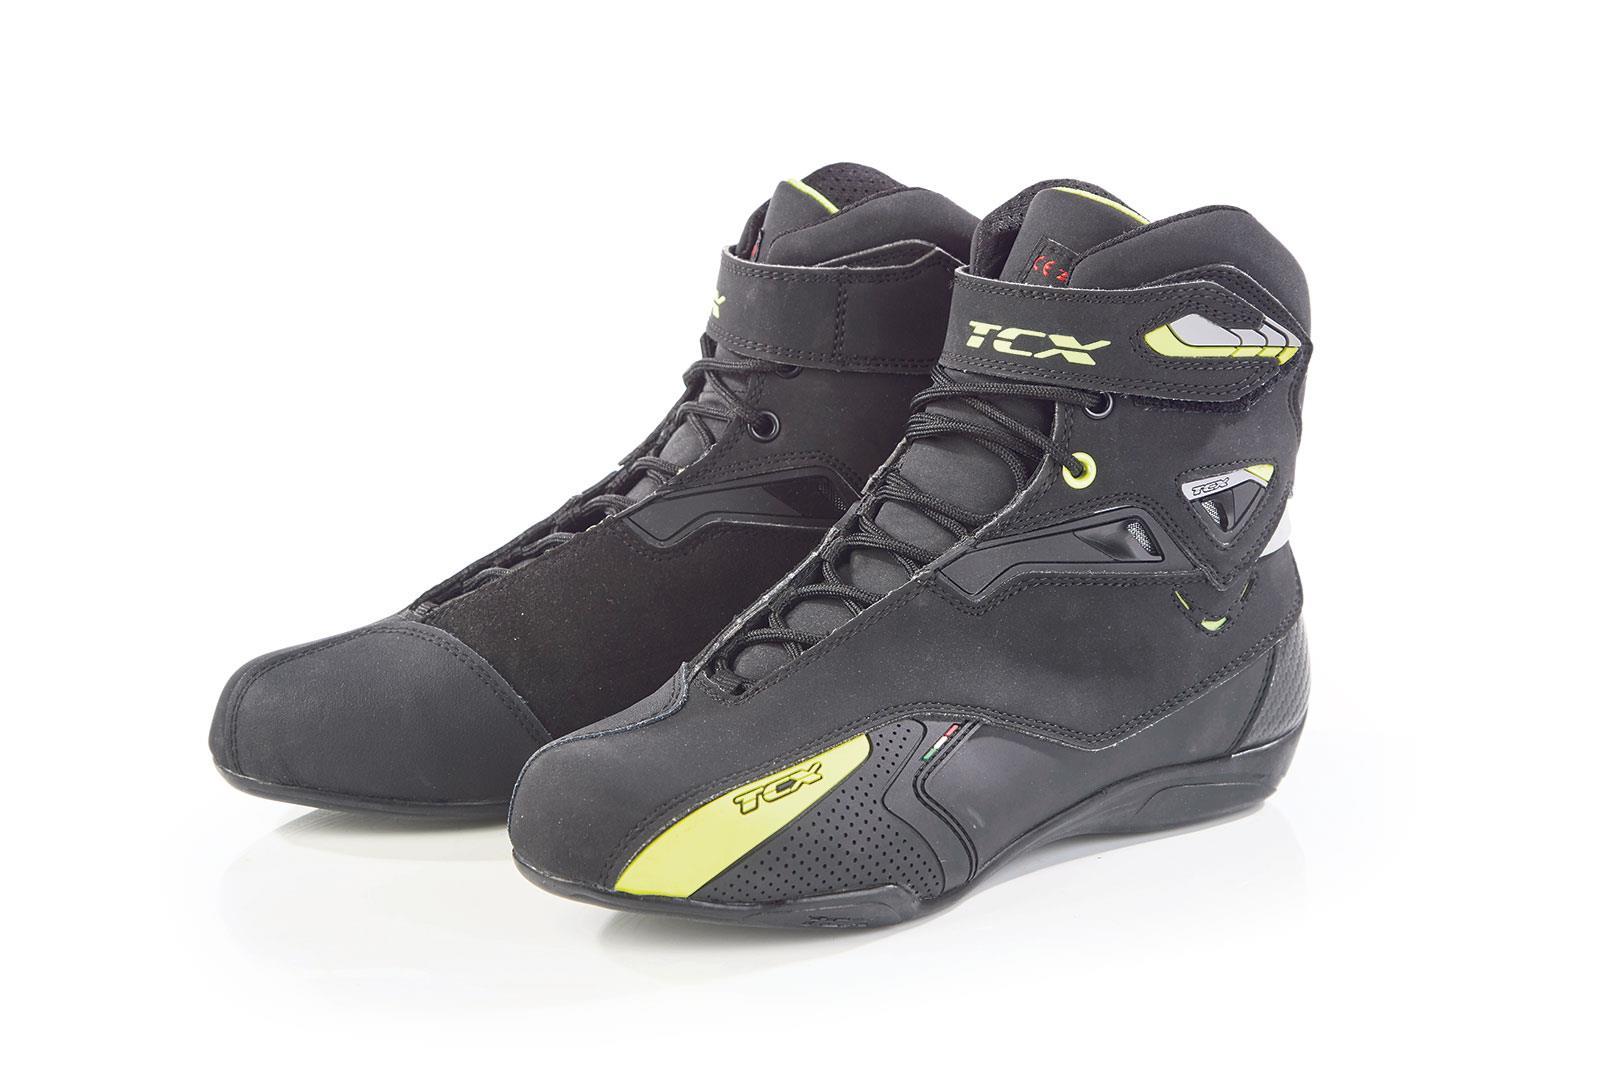 TCX Rush Waterproof boots